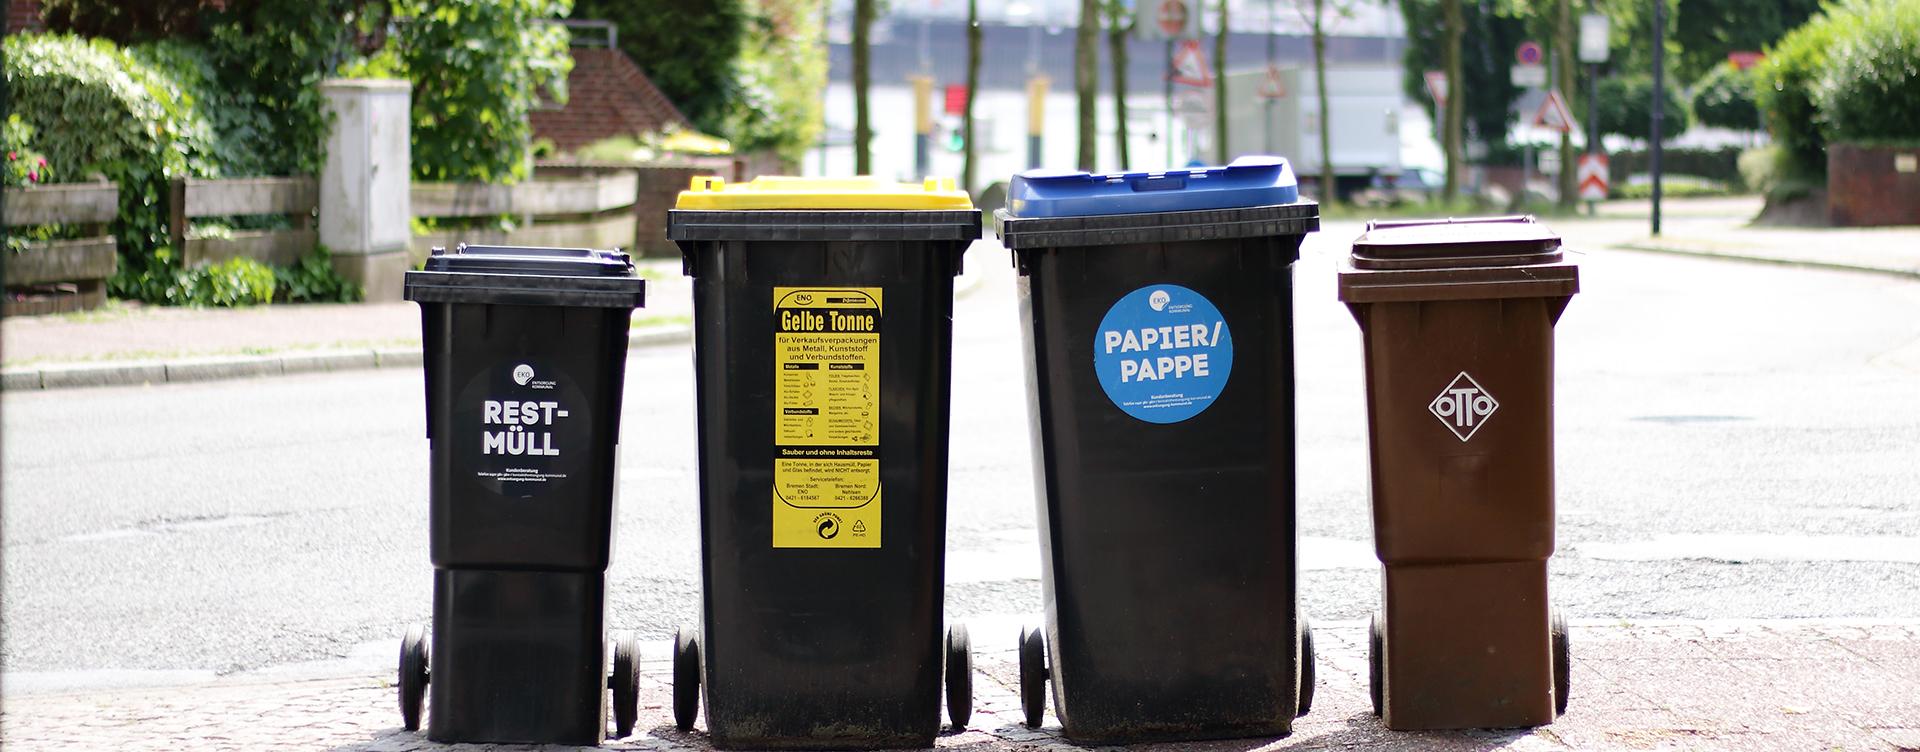 Abfall & Entsorgung - vegesack.de